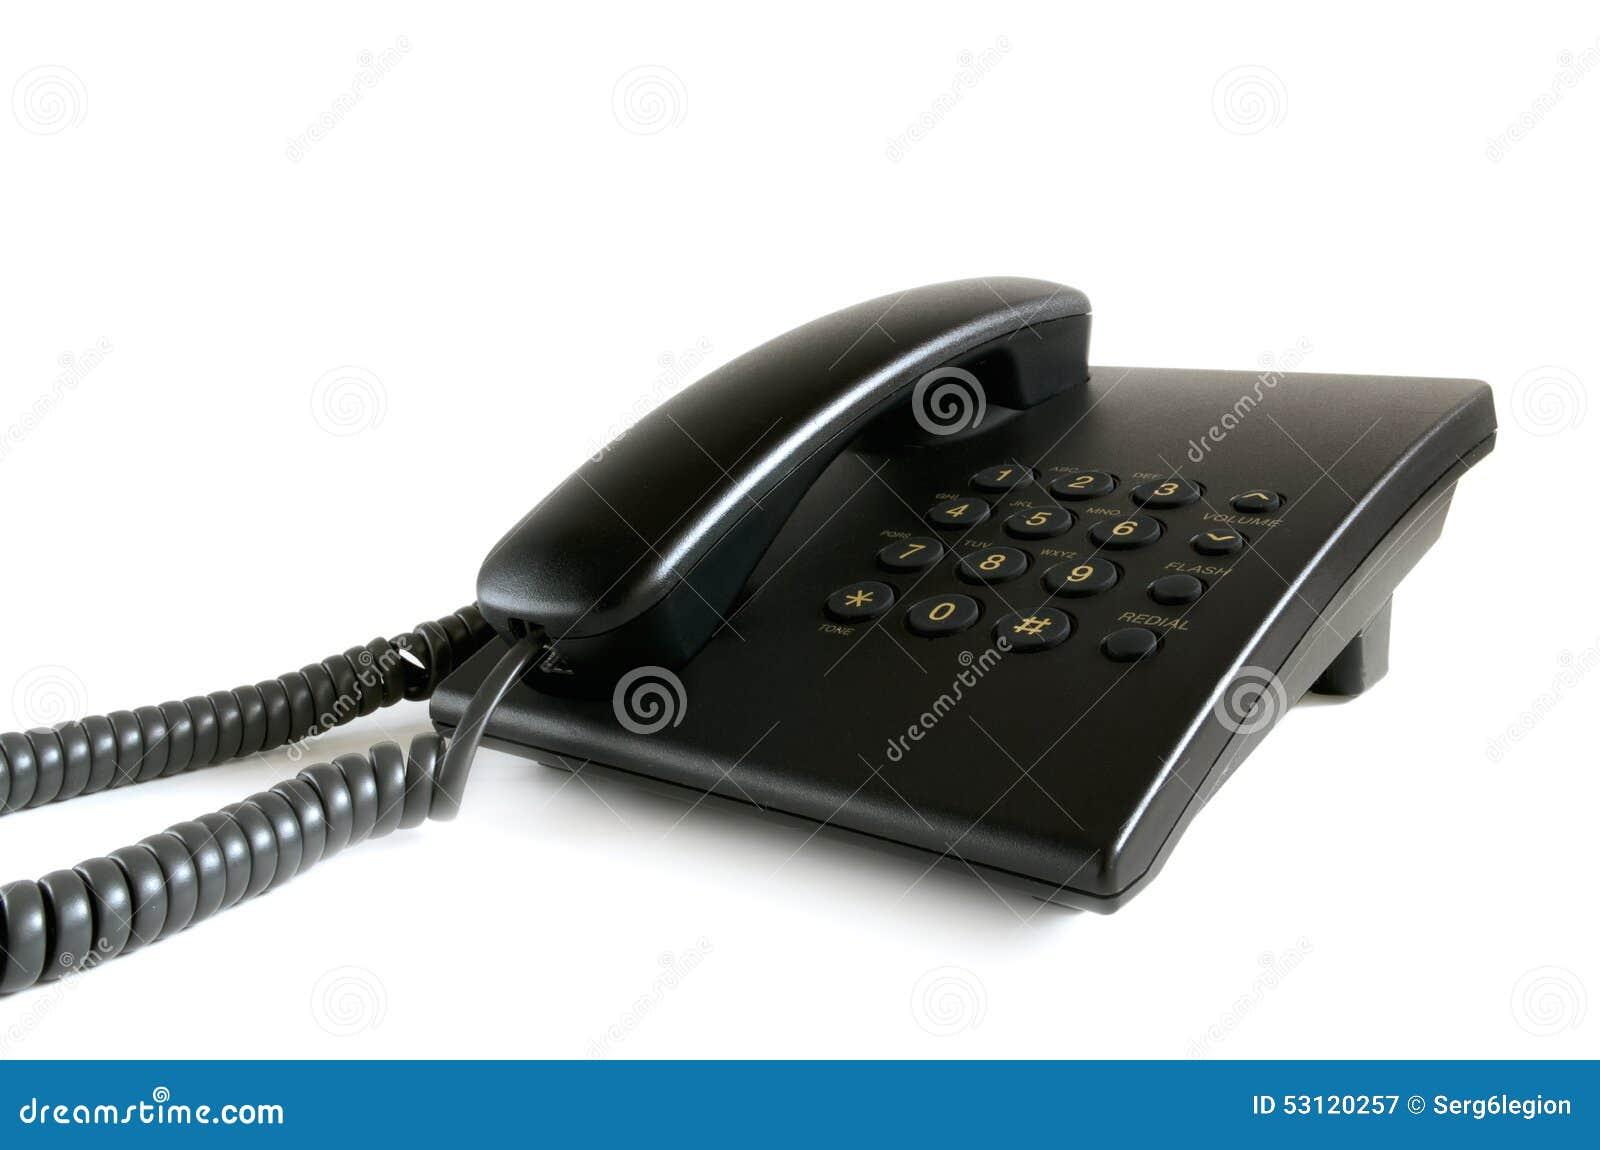 Black stationary phone on a white background stock image image of